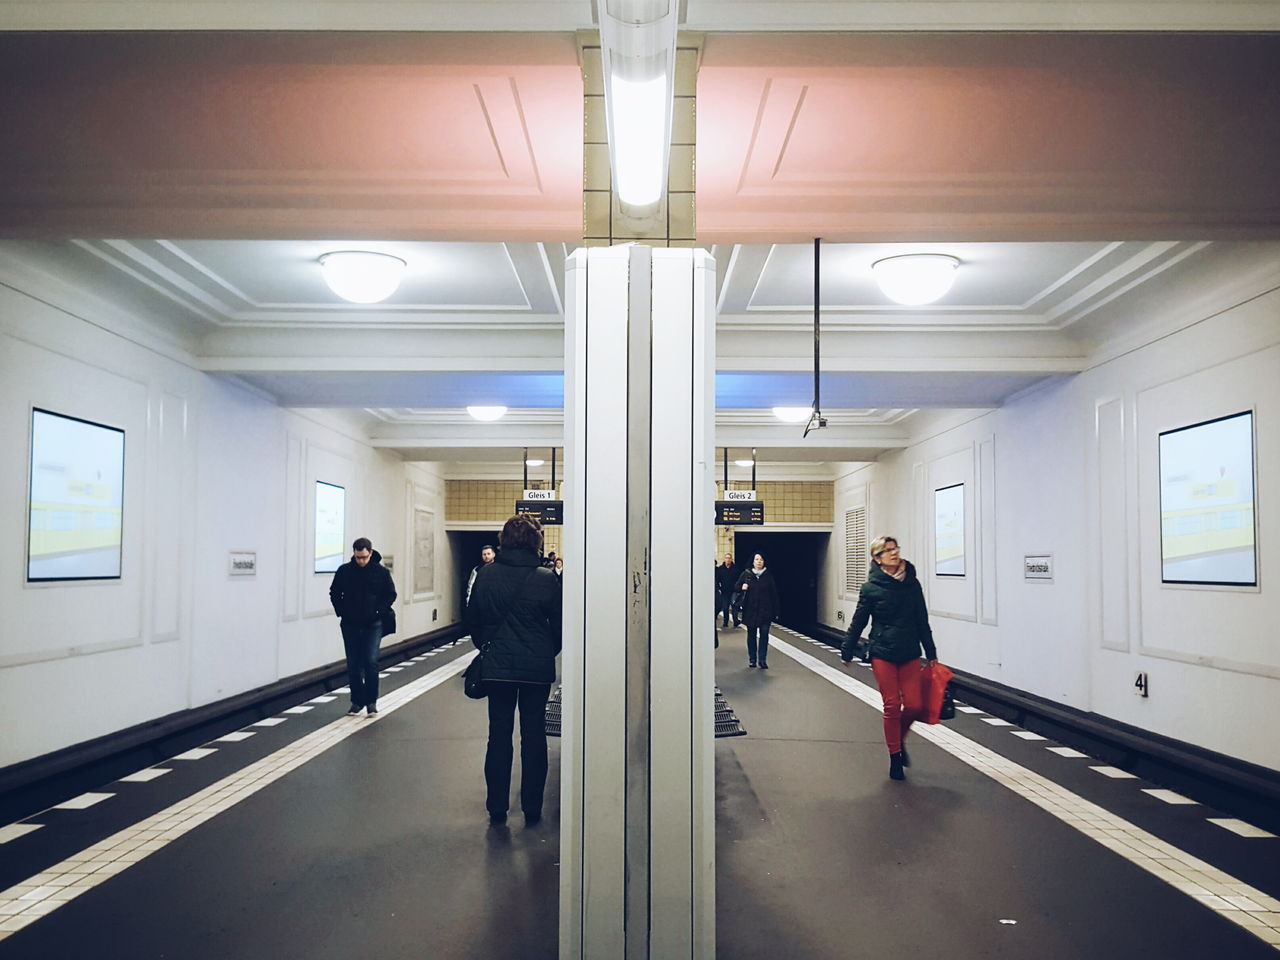 indoors, men, real people, full length, illuminated, walking, women, transportation, architecture, day, people